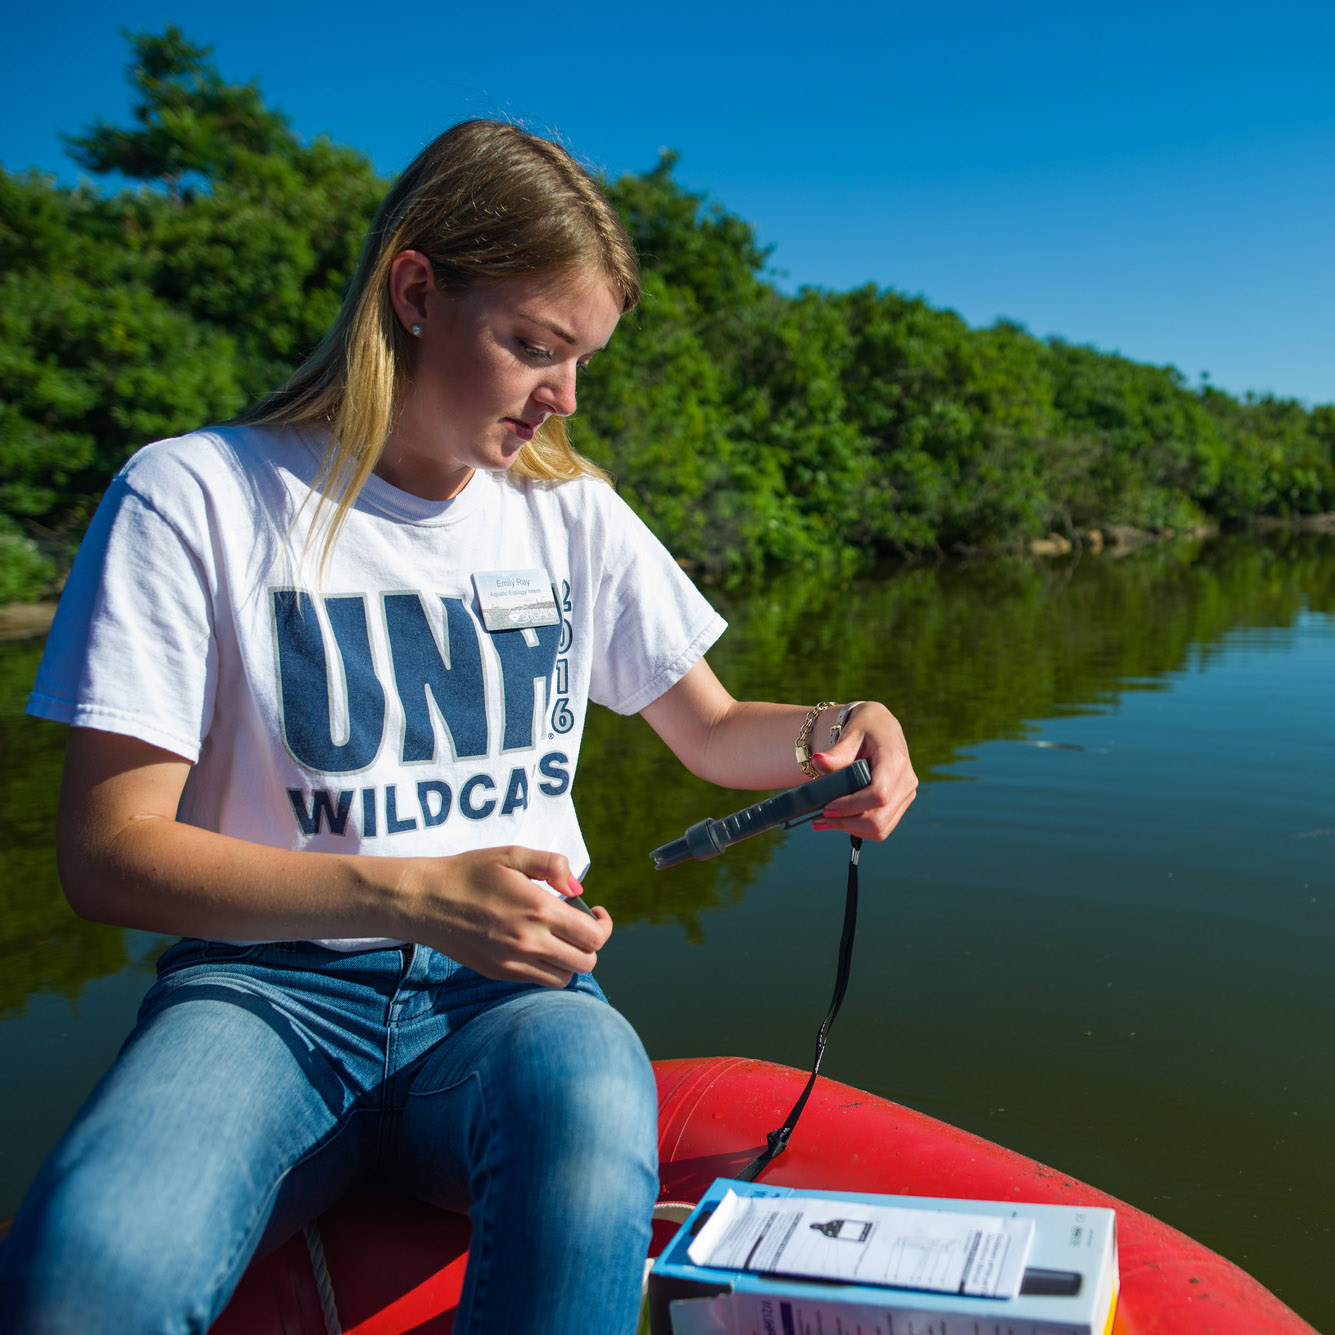 Student taking measurements of lake water